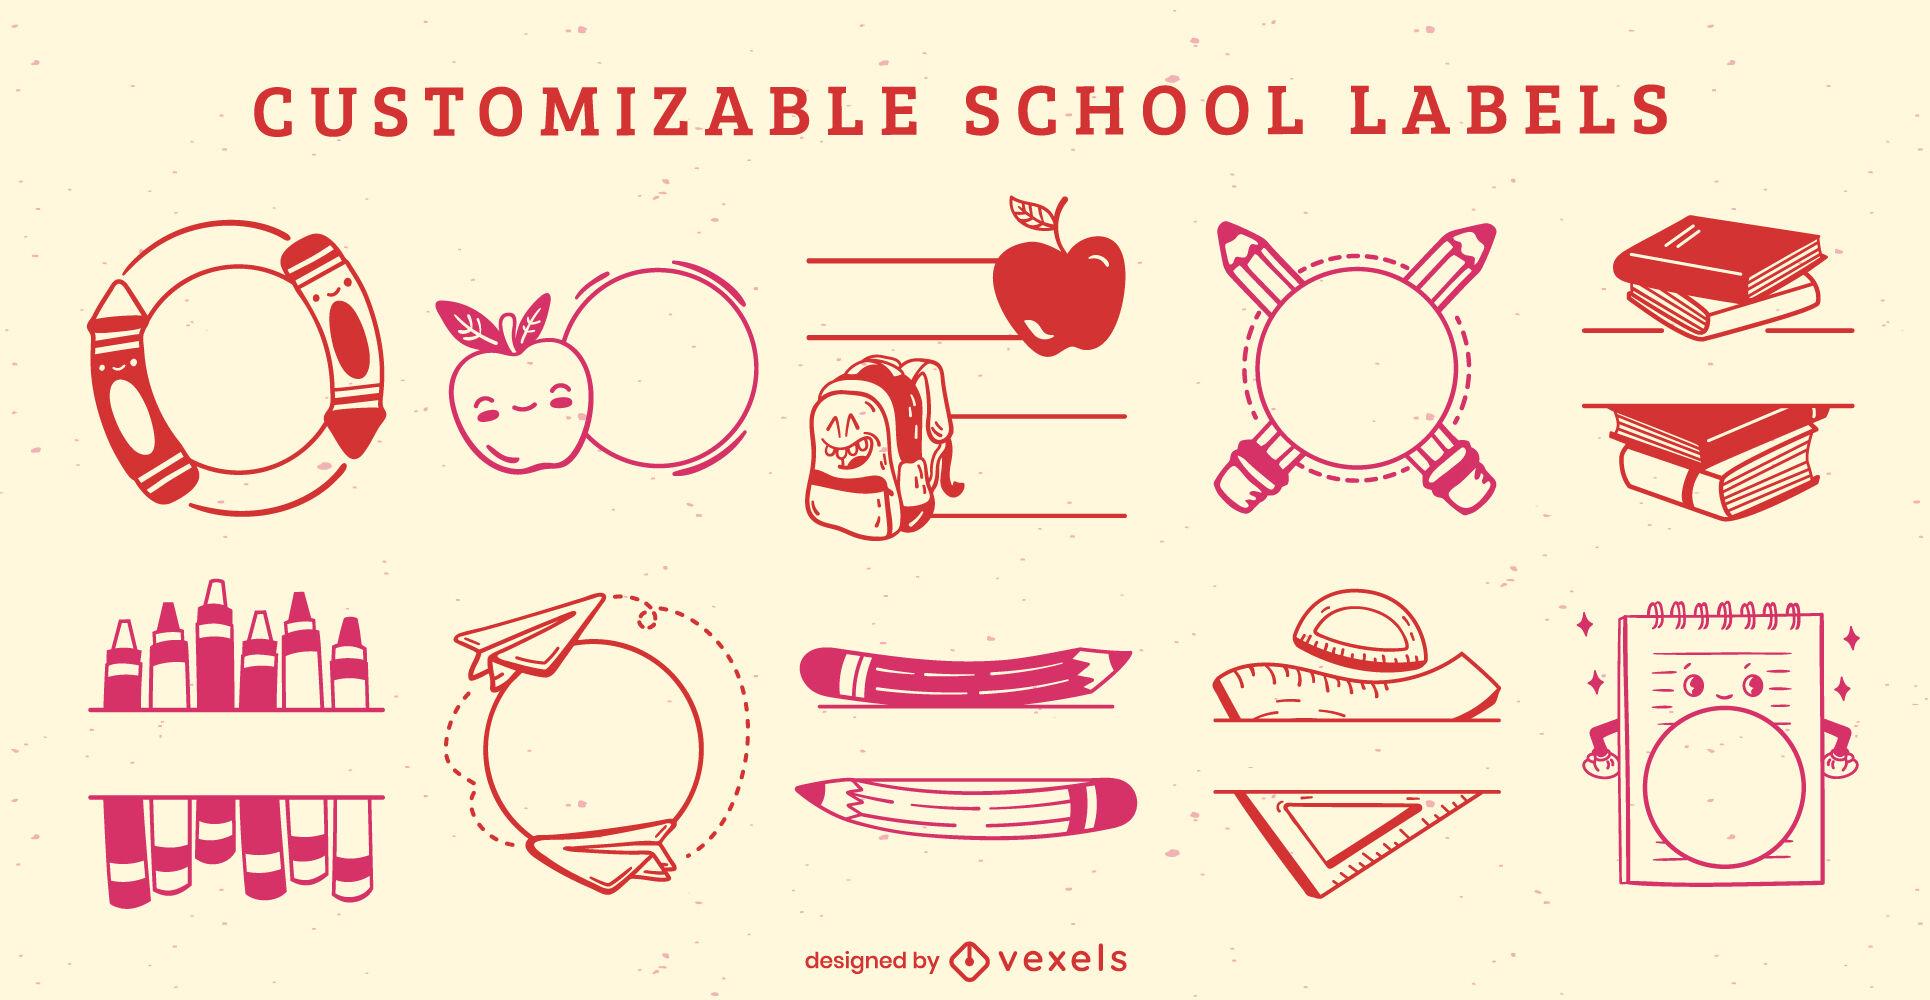 Customizable school label elements